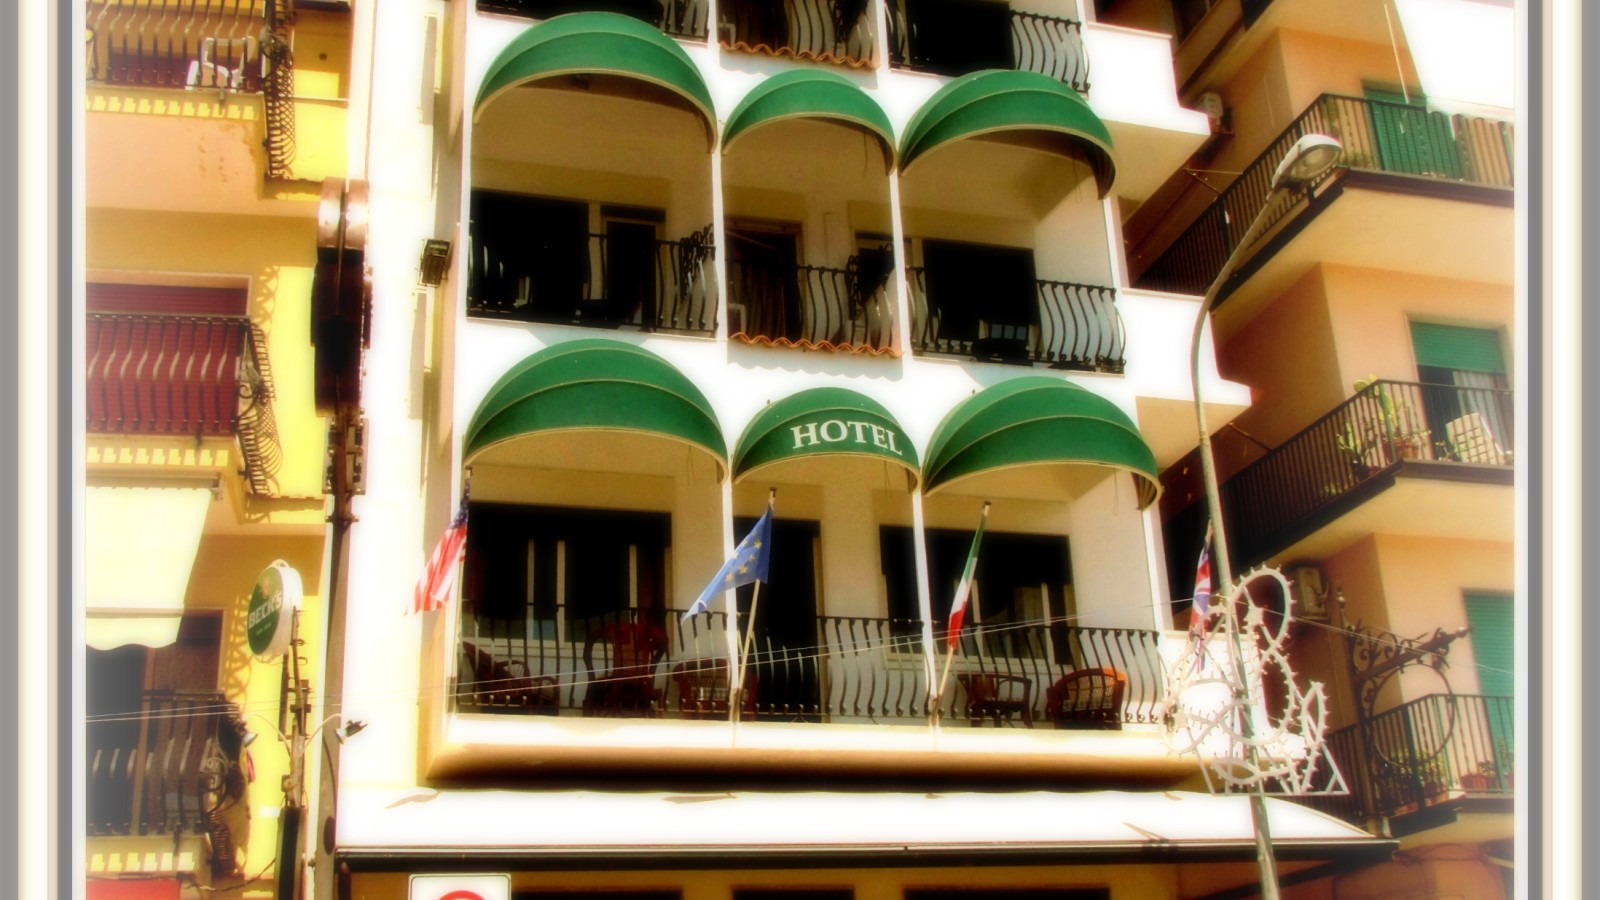 Hotel tysandros giardini naxos - Hotel la riva giardini naxos ...